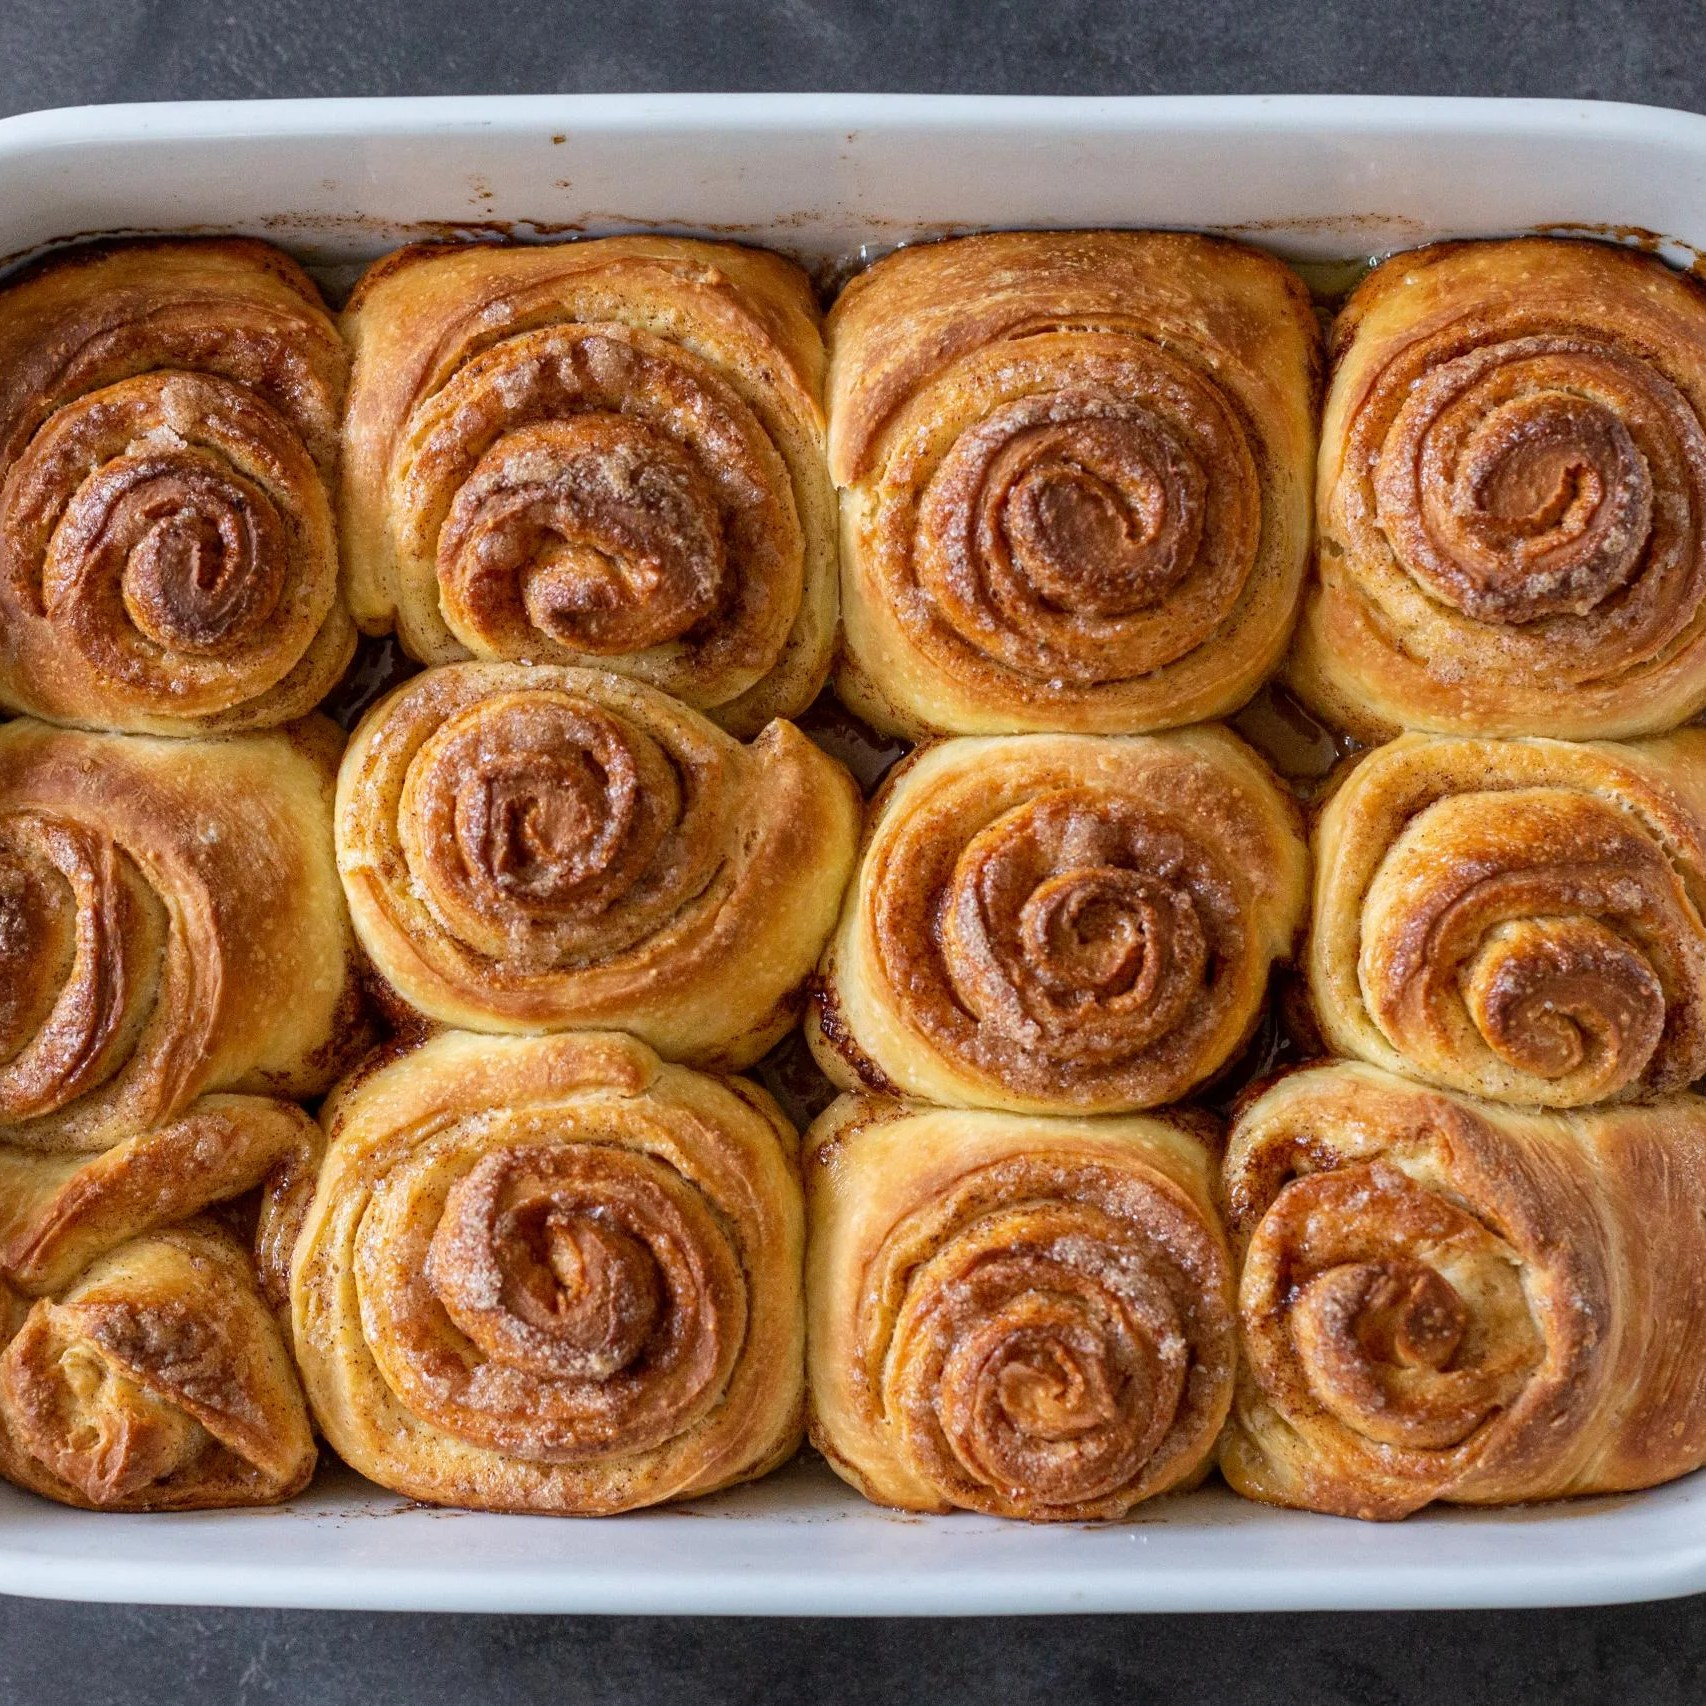 baked cinnamon rolls on a baking sheet